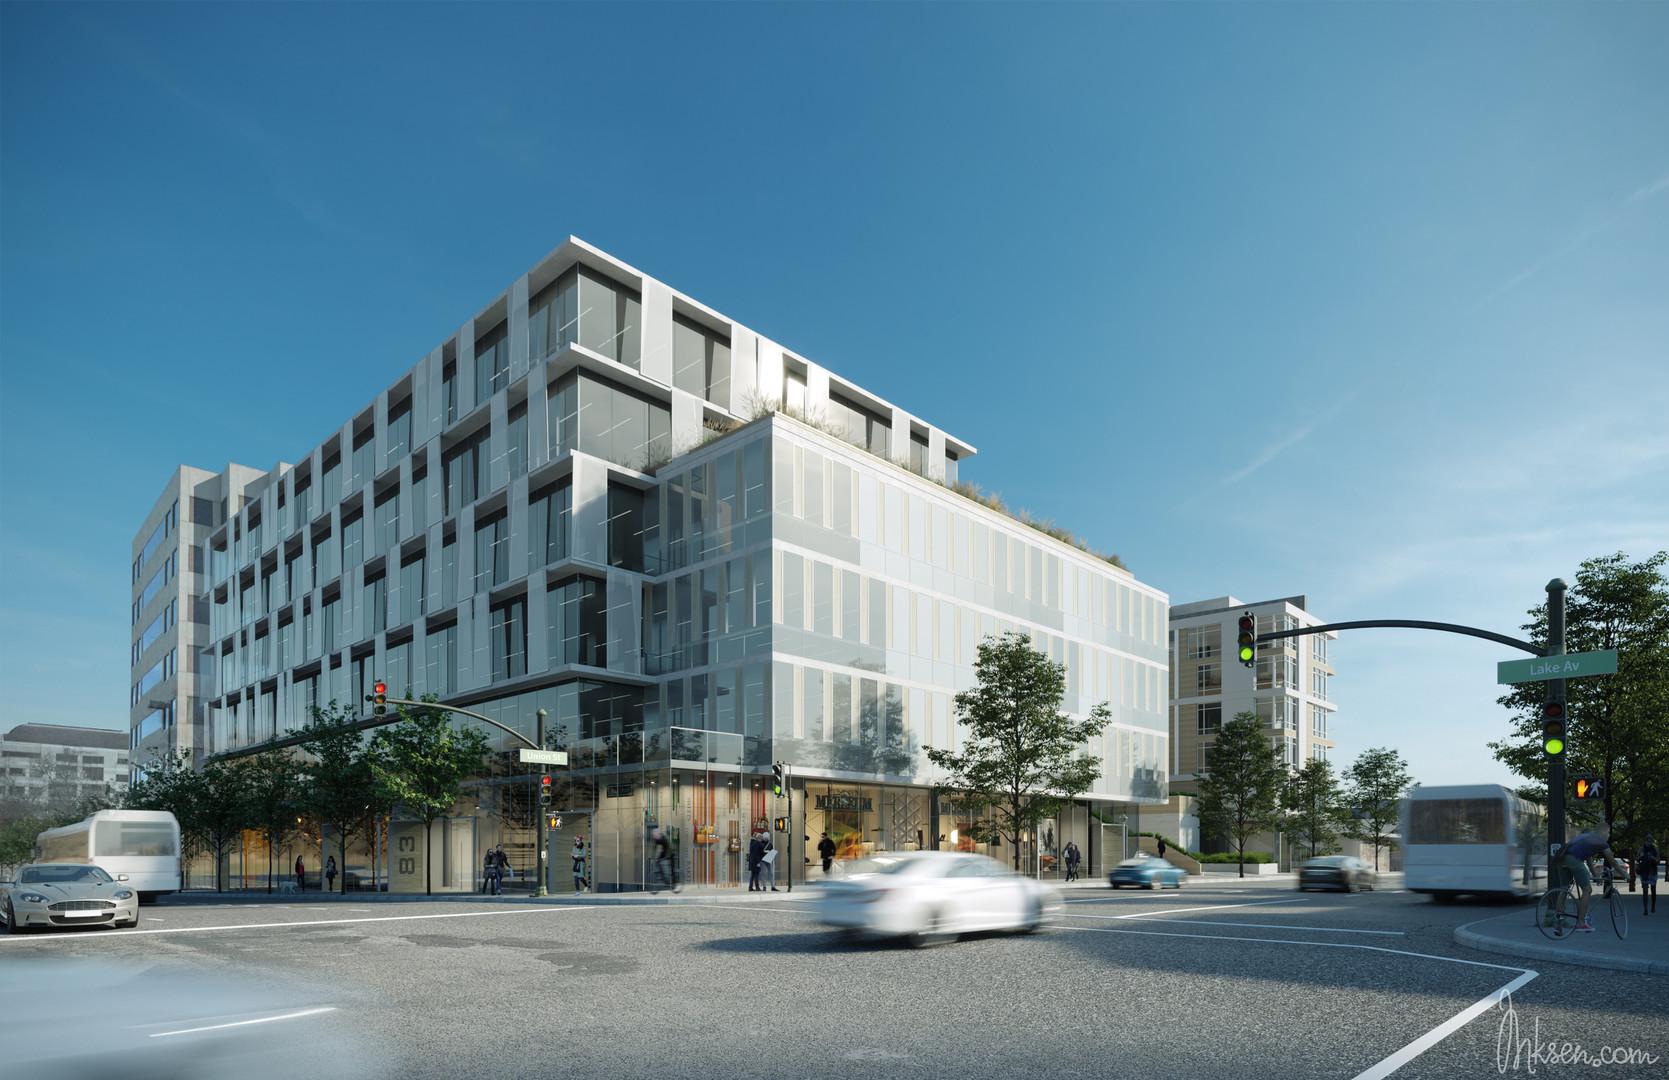 83 North Lake Avenue, Pasadena, California  Created for: